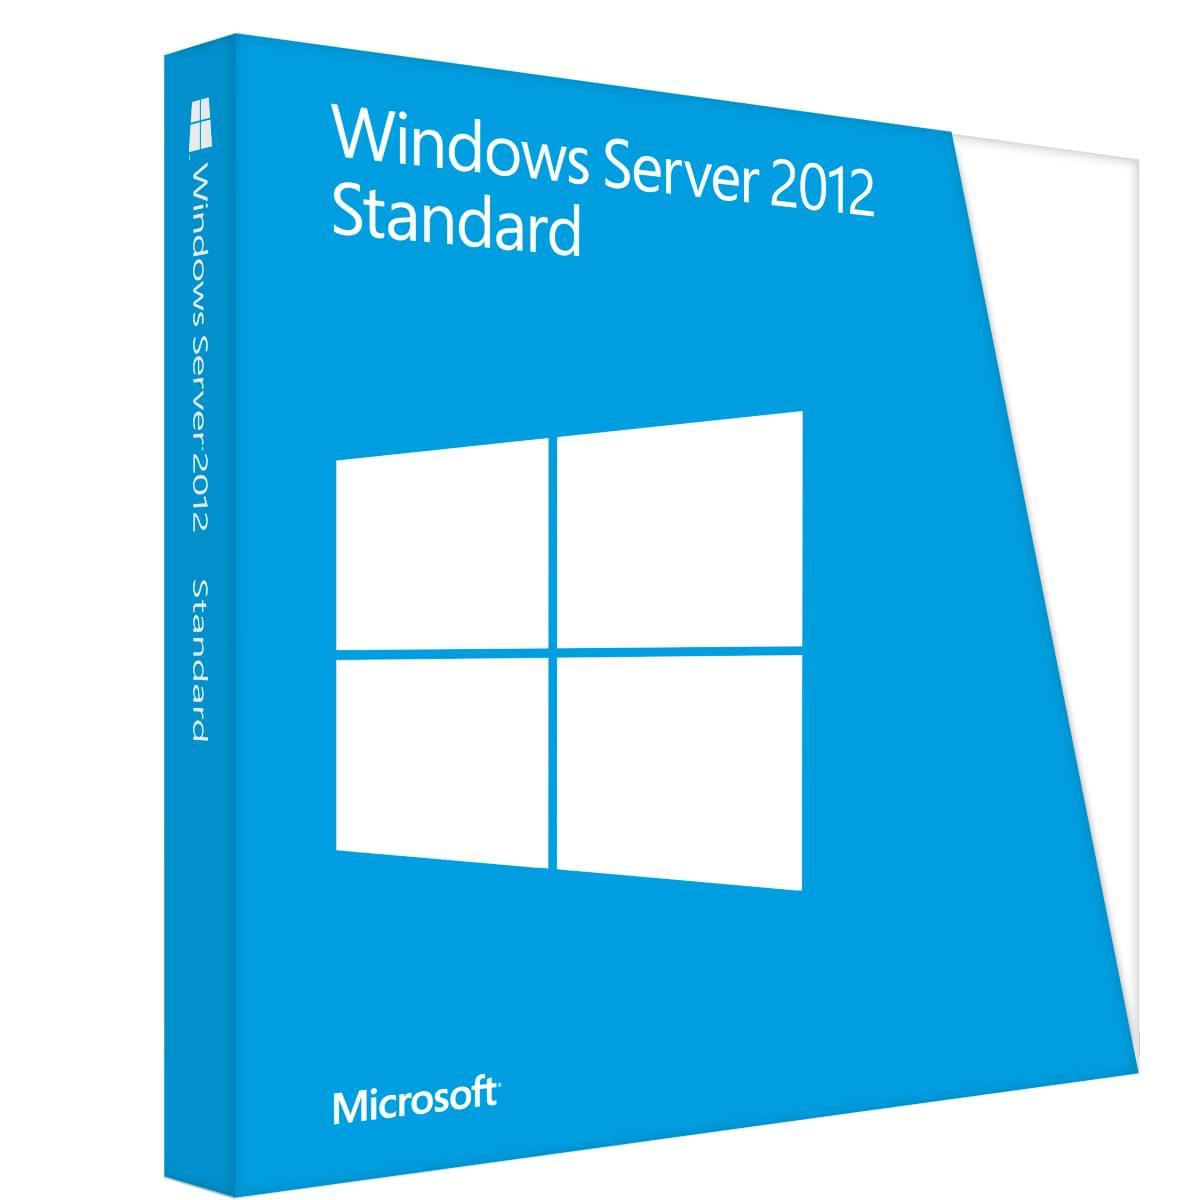 Microsoft CAL User Windows Server 2012 COEM (R18-03738) - Achat / Vente Logiciel système exploitation sur Cybertek.fr - 0